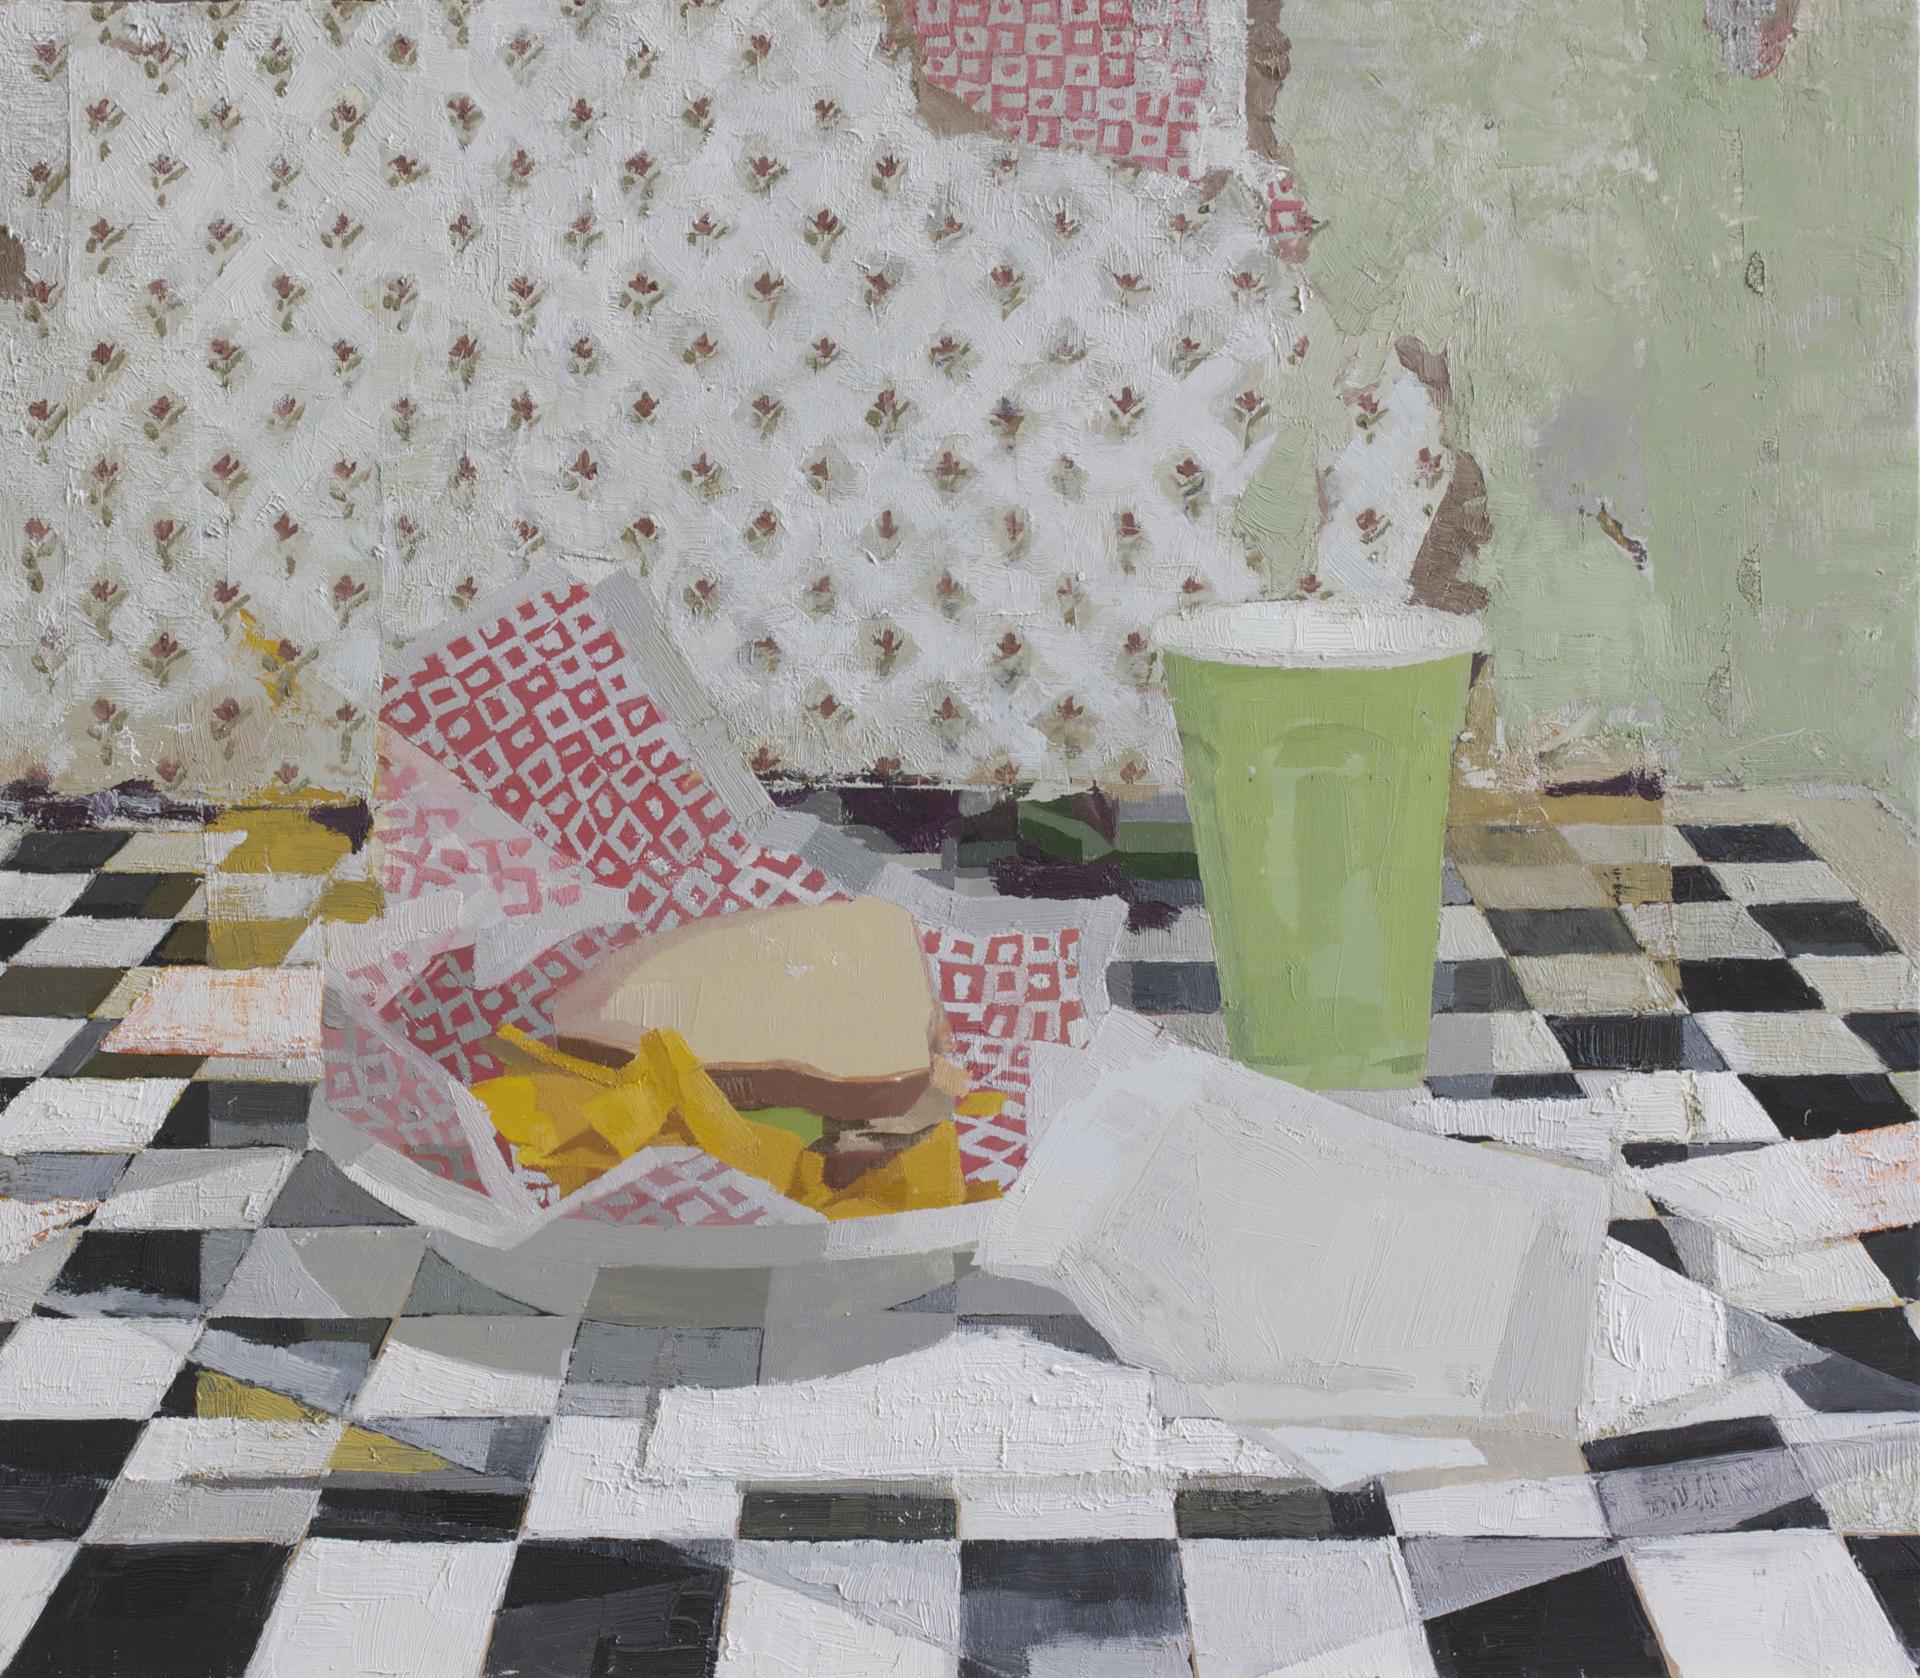 Sandwich #5 by Zoey Frank